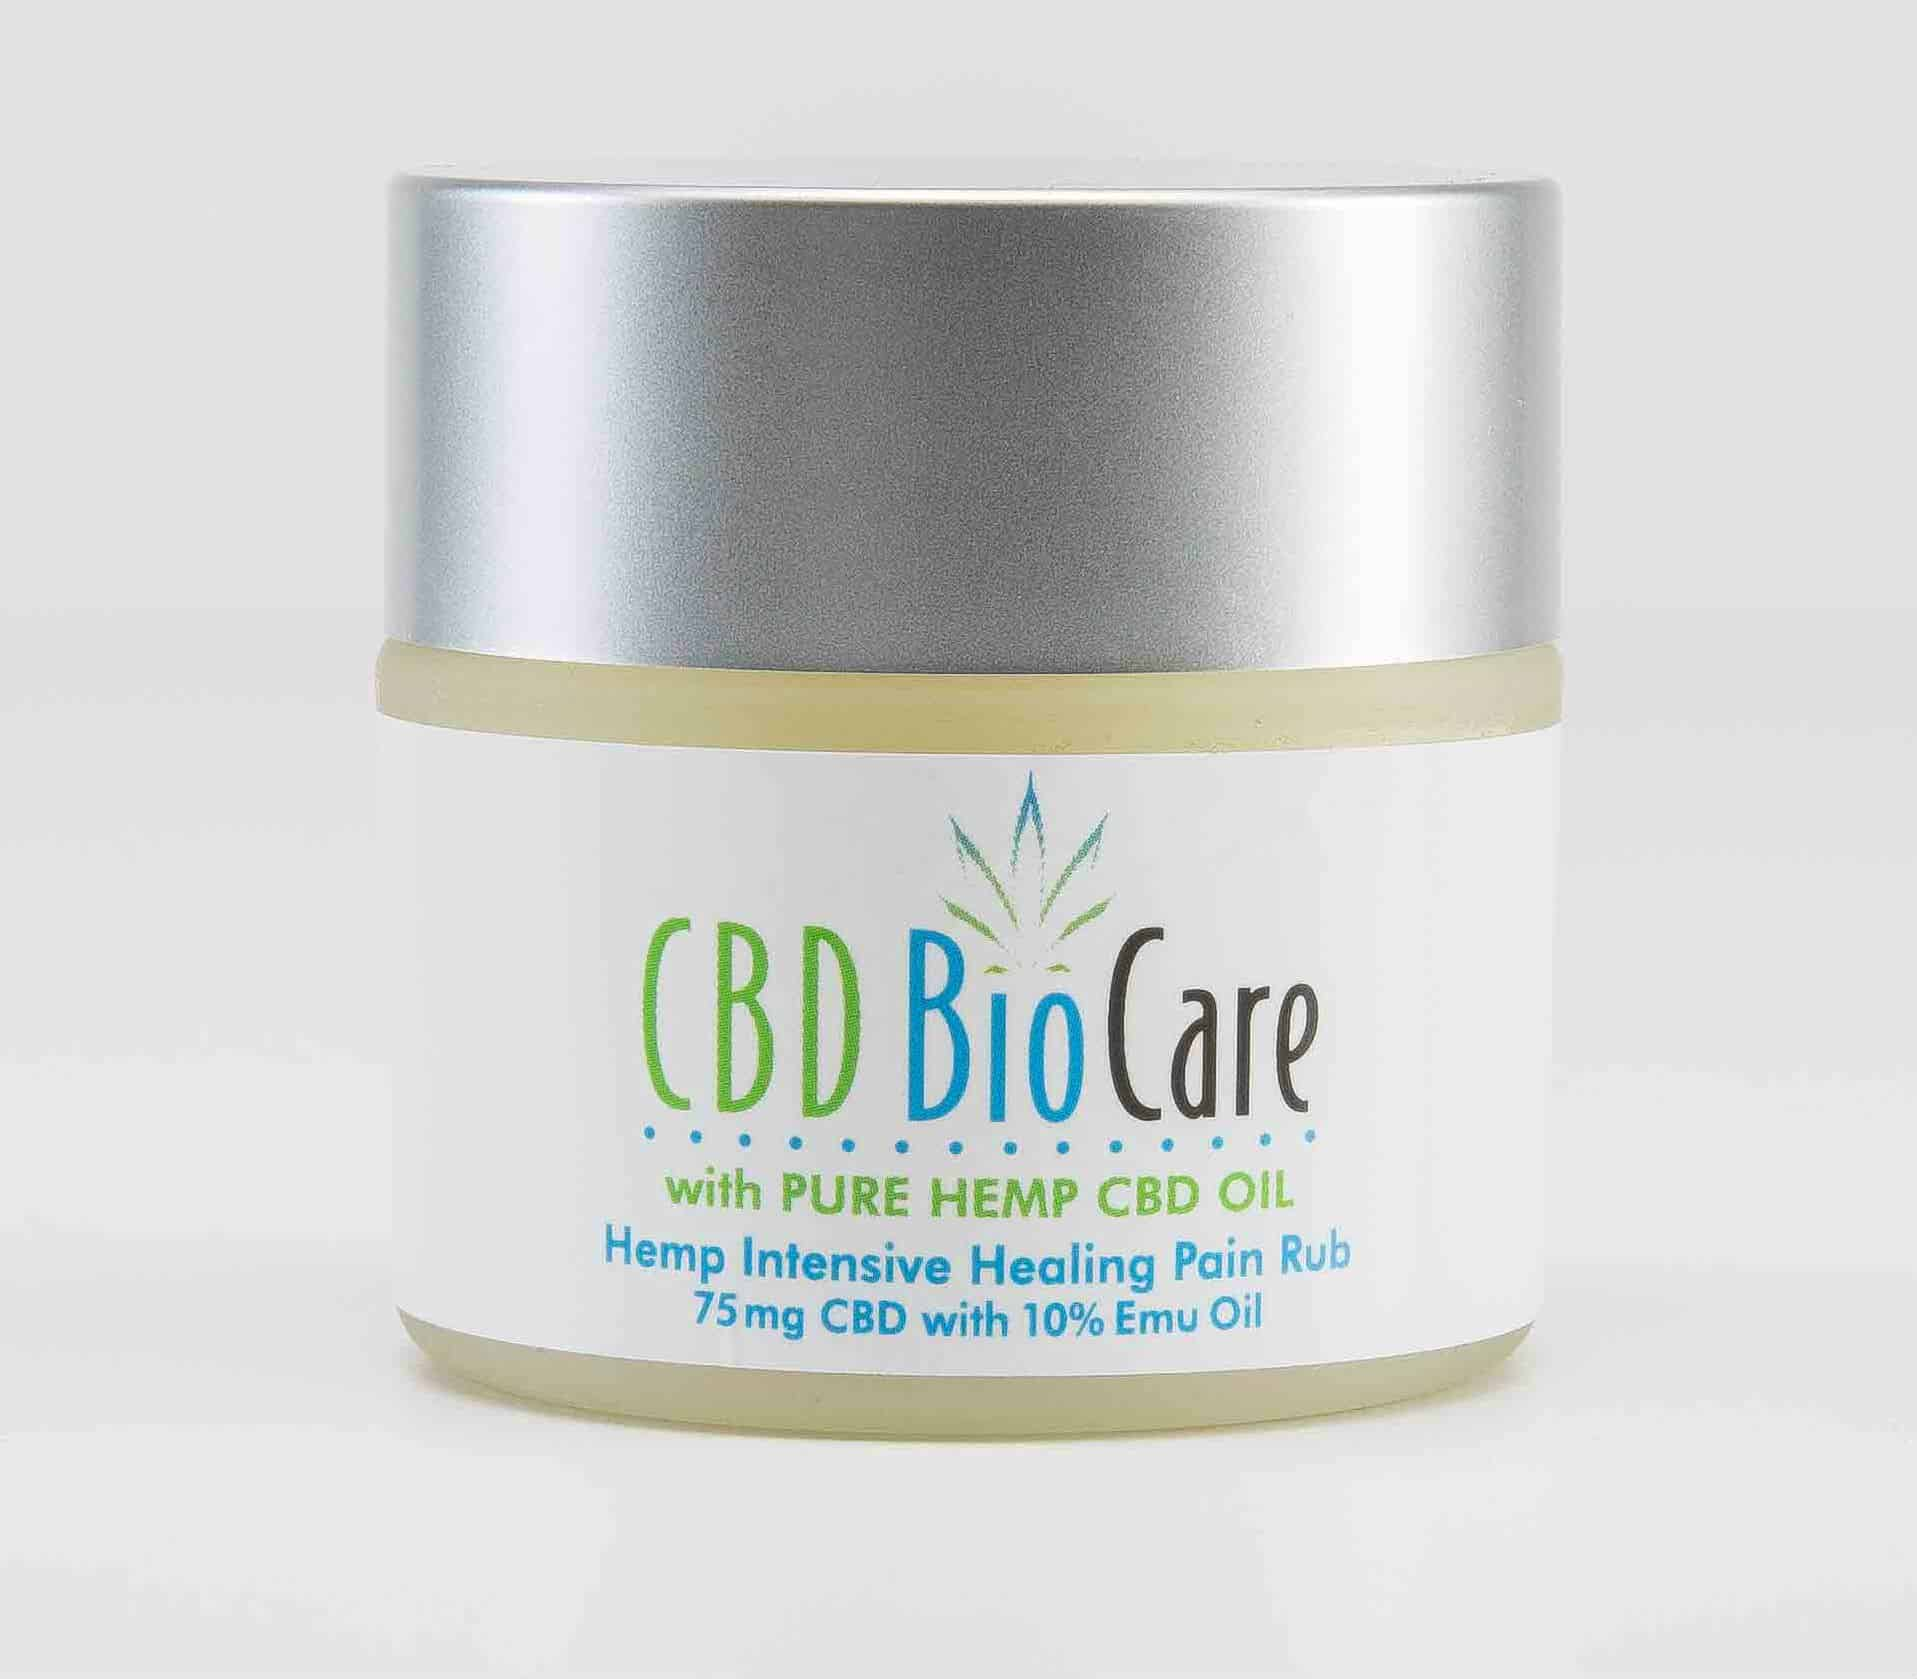 CBD BioCare Pain Rub With Emu Oil